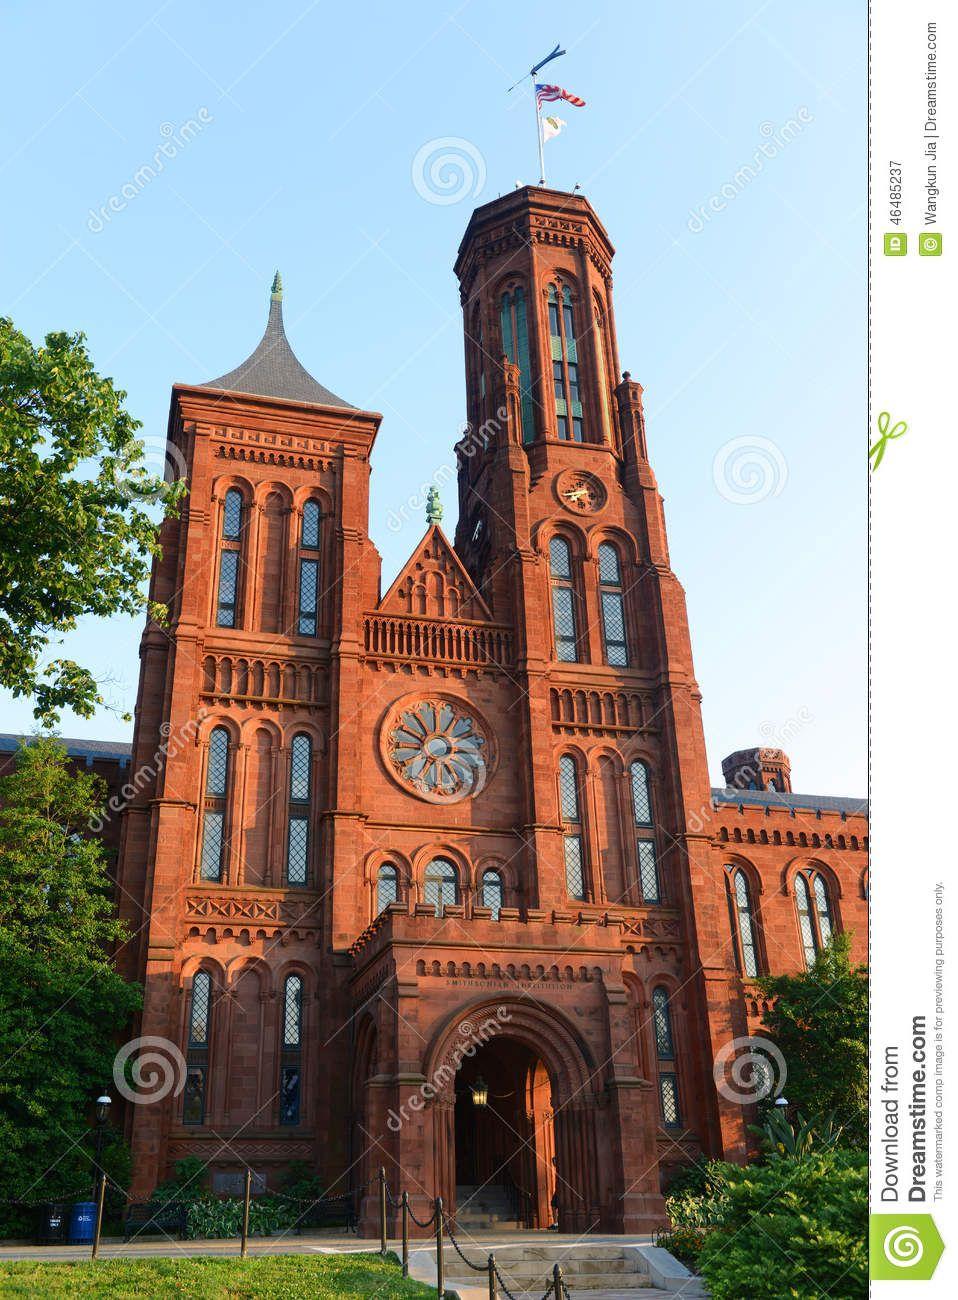 smithsonian-castle-washington-dc-usa-front-victorian-facade-district-columbia-46485237.jpg 958×1,300 pixels